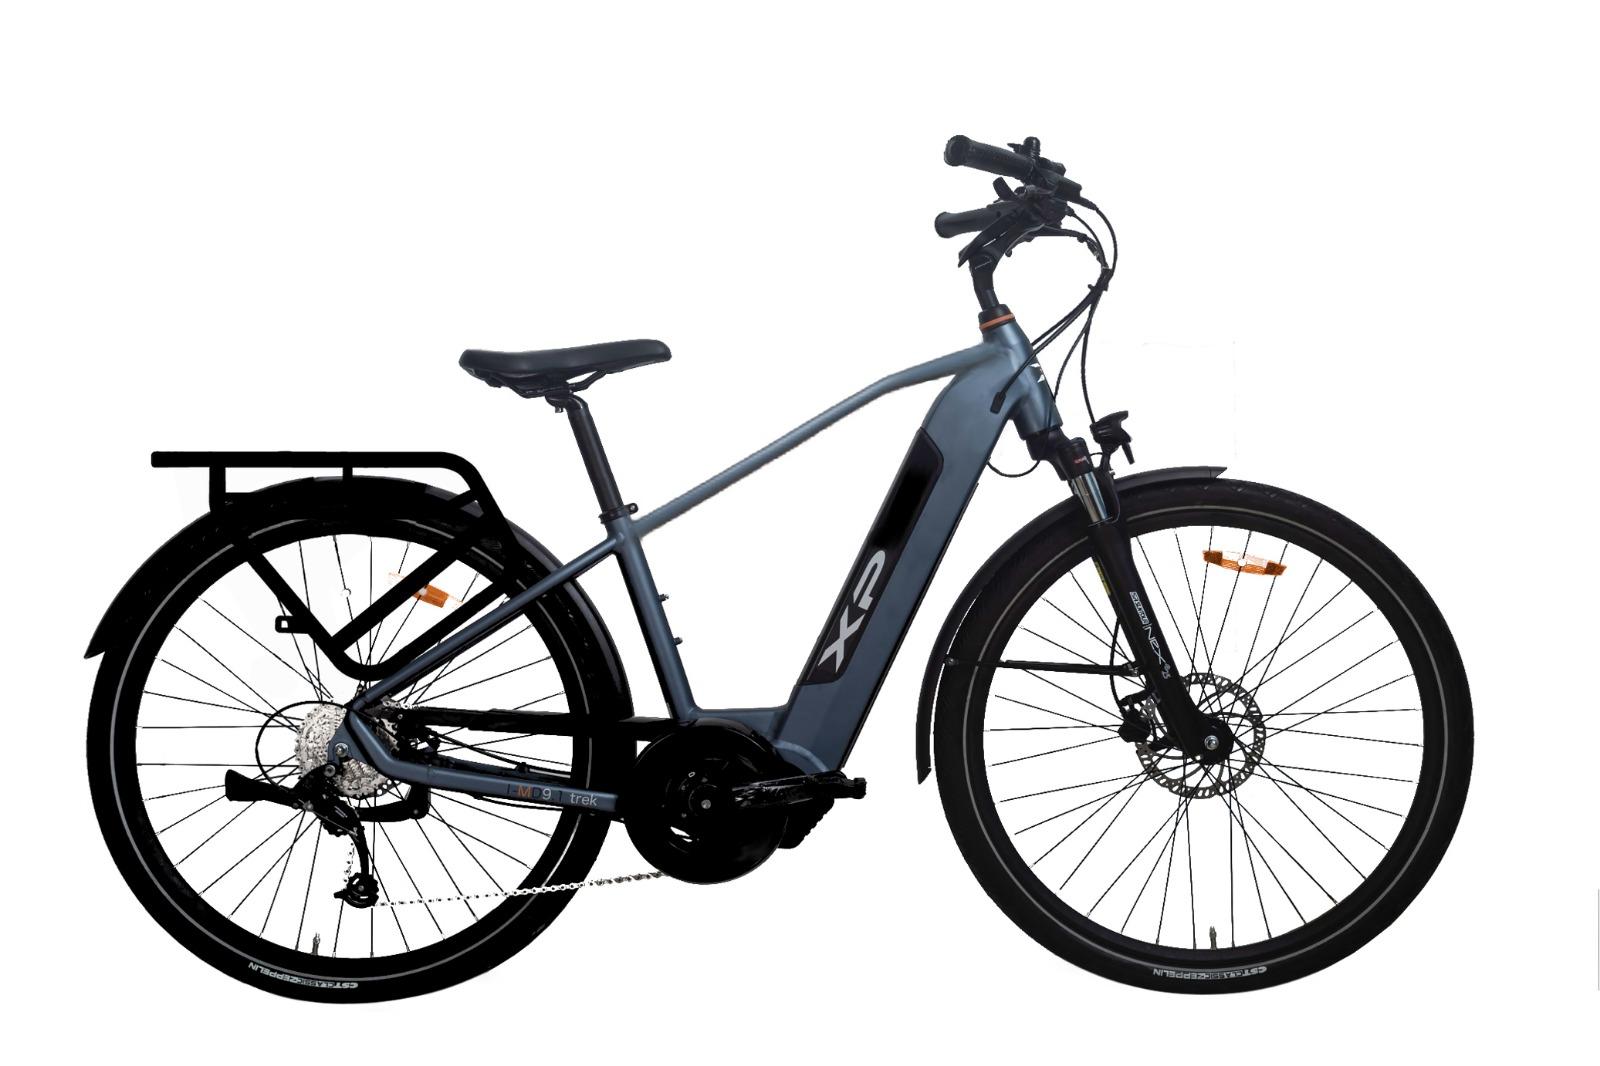 greenbike pesaro-bici elettriche motore centrale-XP bikes-I-D9.1